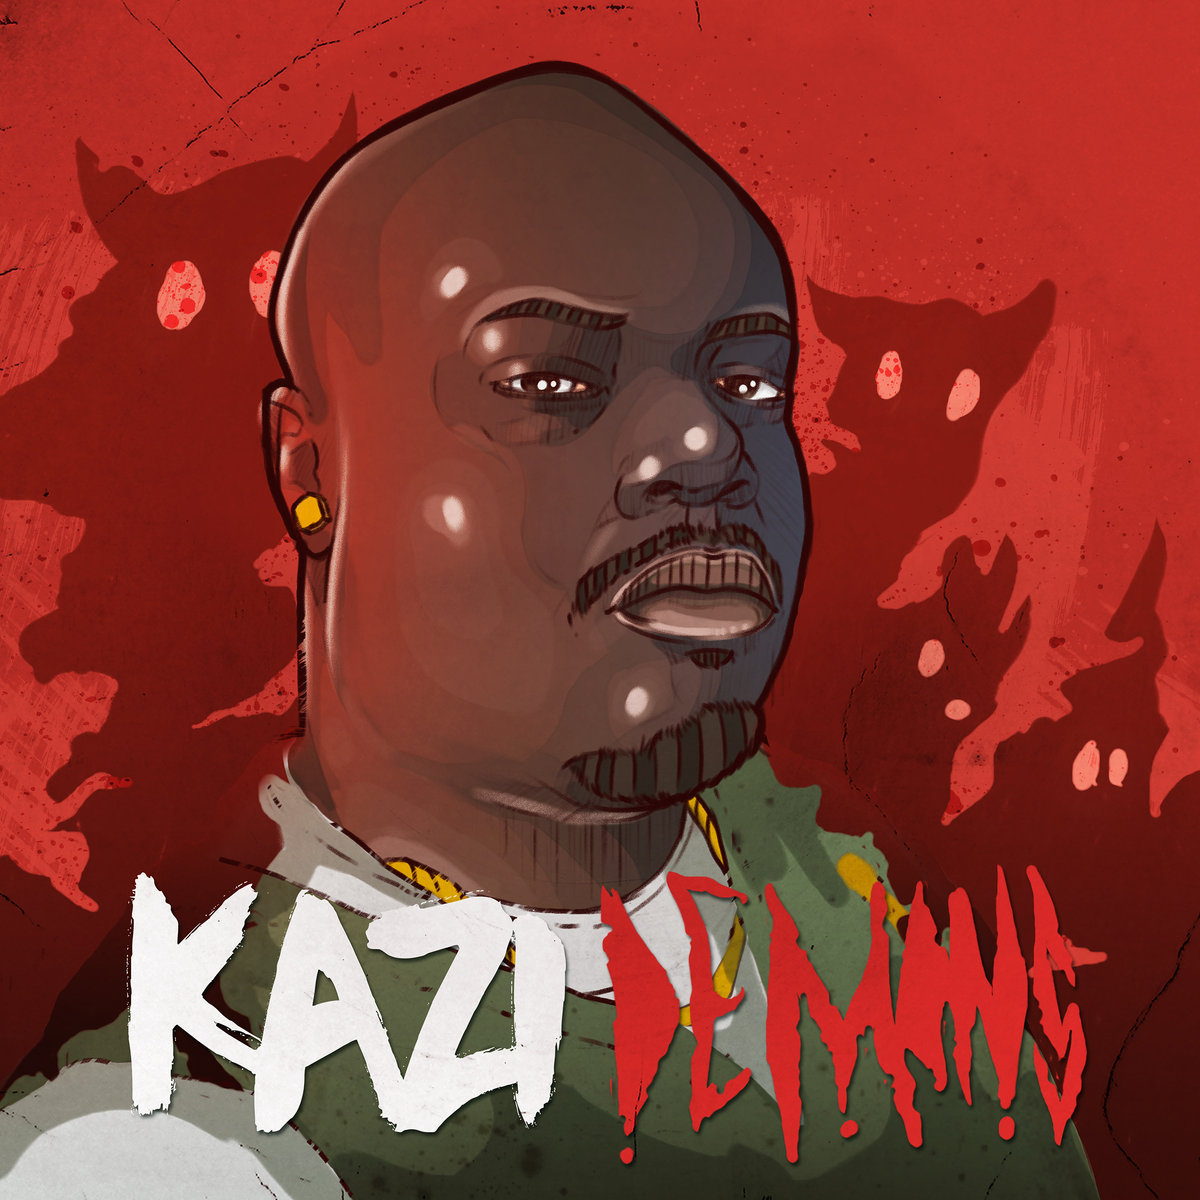 Stream_kazi_presenta_demons